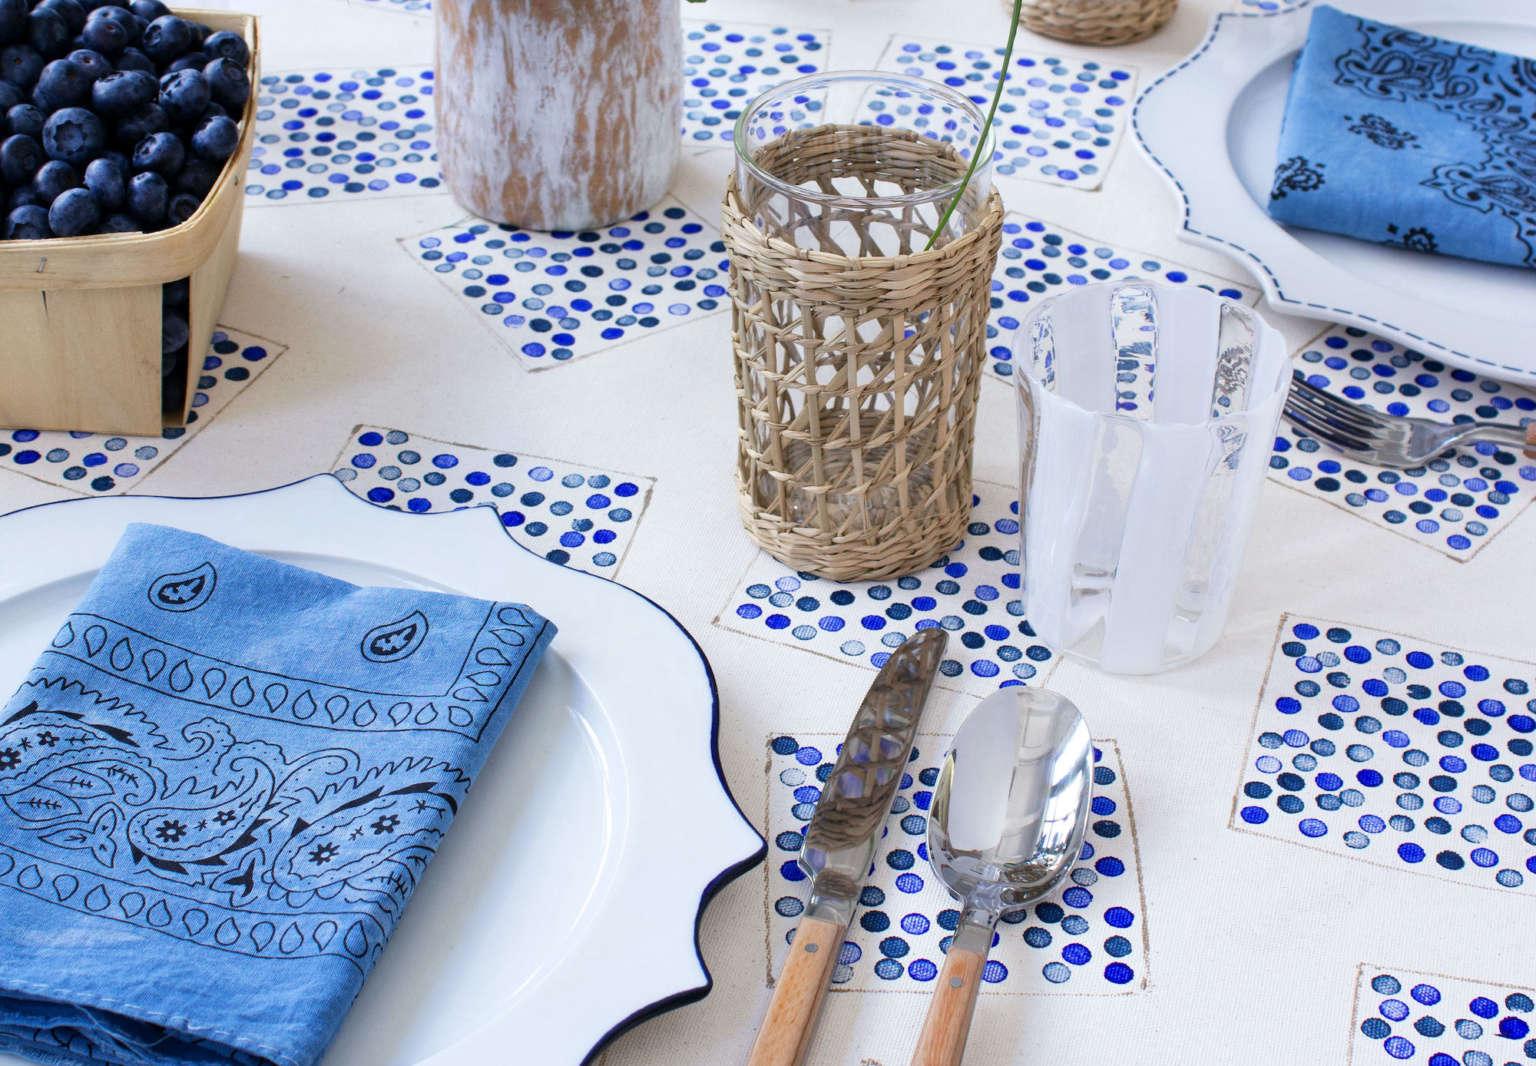 david stark design fourth july blueberry tablecloth decoration diy7